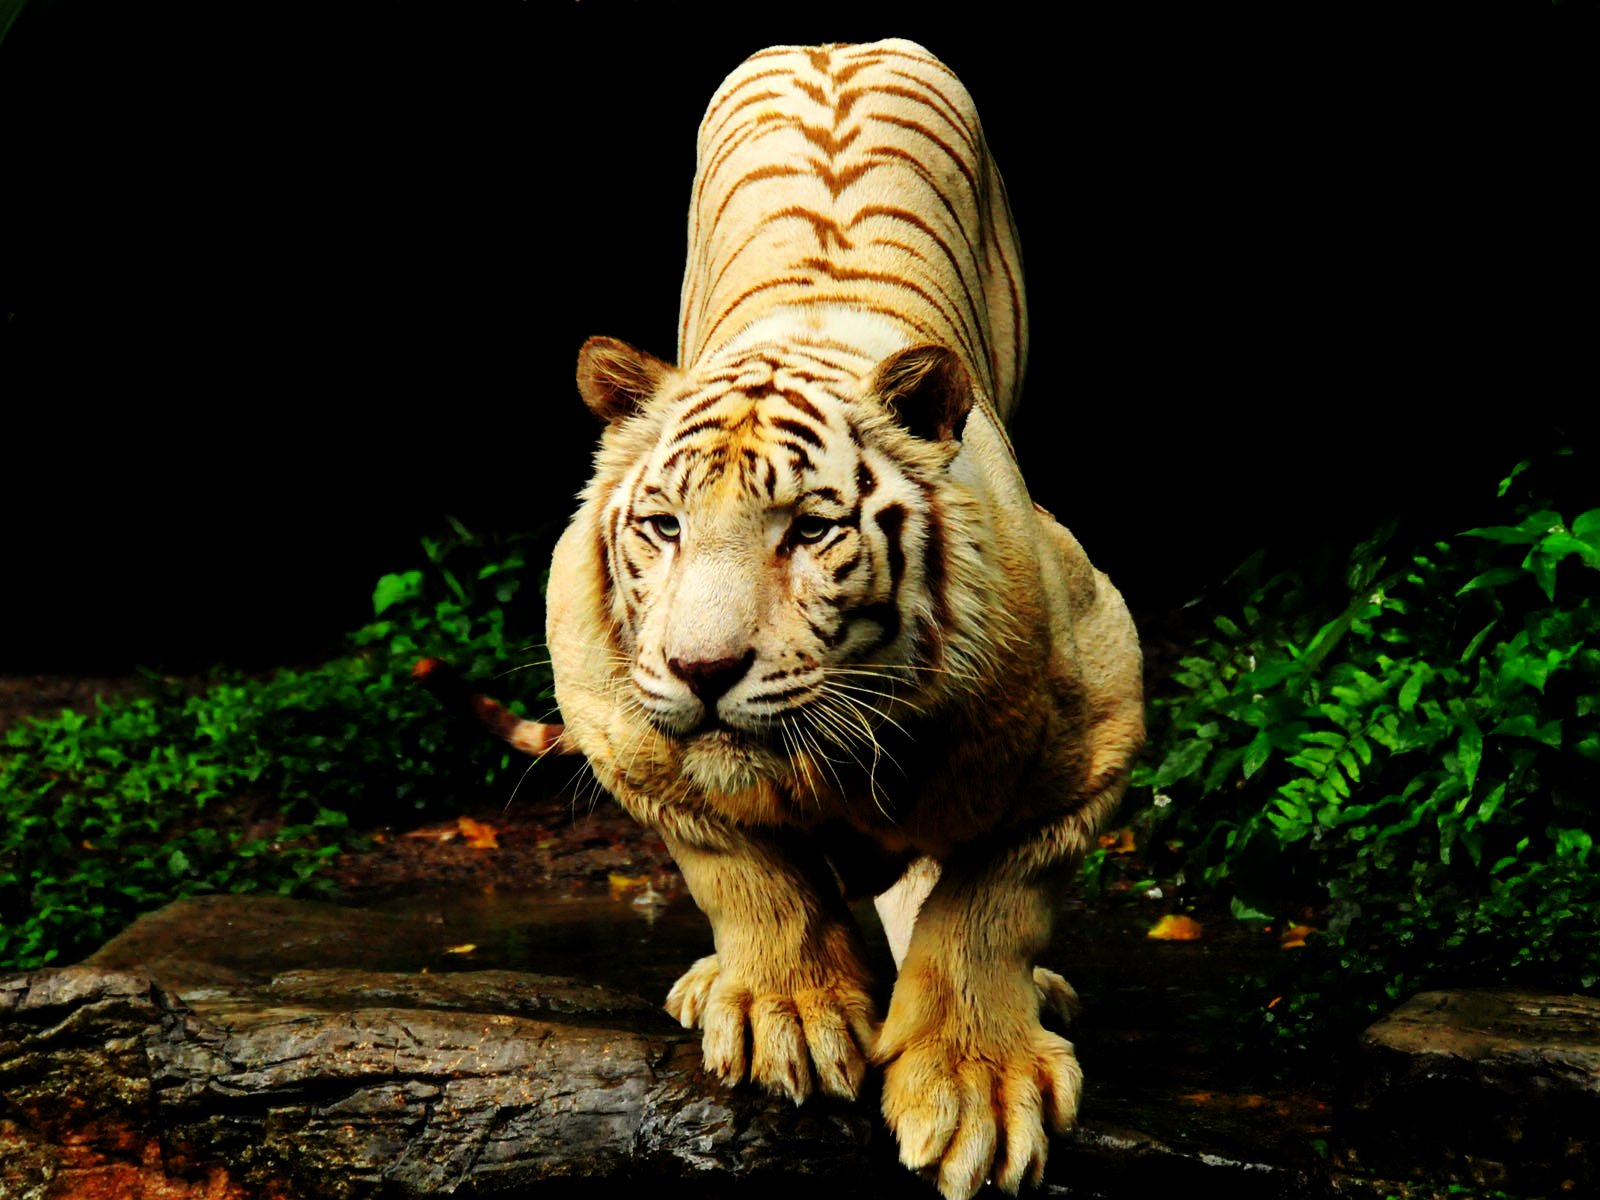 Download Tiger Attack Wallpaper Hd Wallpaper Bagus